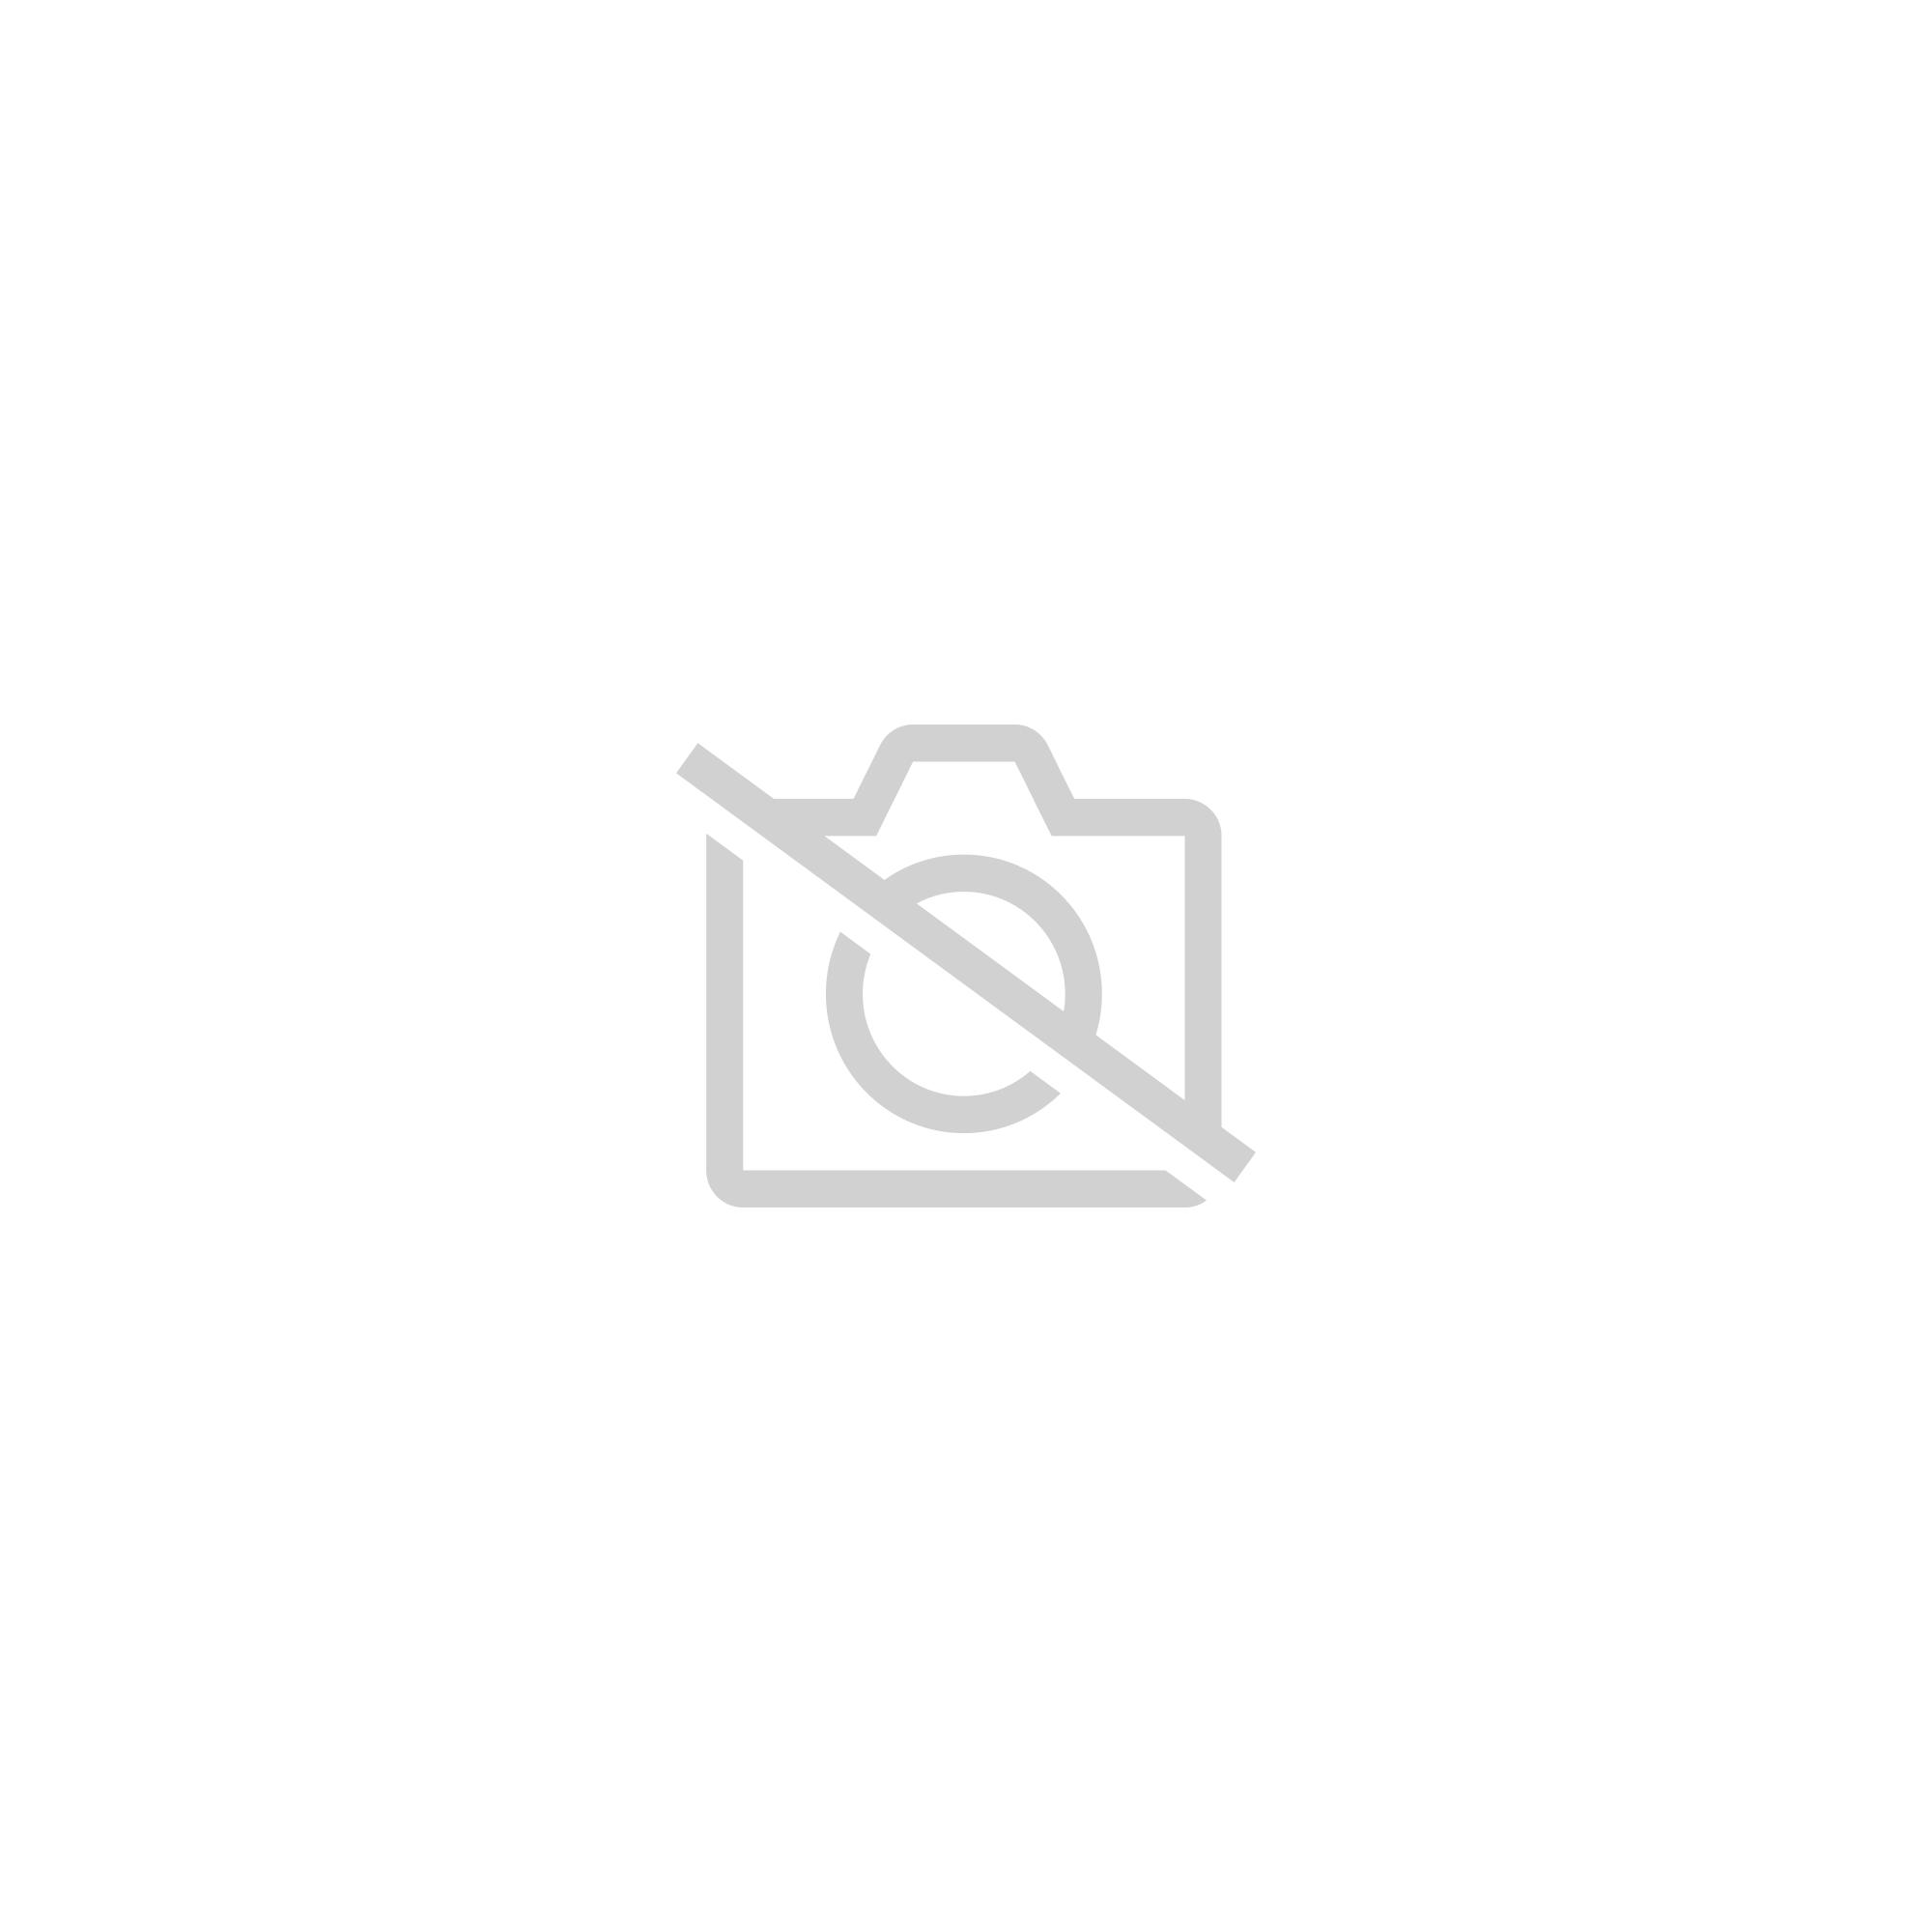 783e5e1b7e3 Blouson Ski Rg 512 Taille M Noir Rouge - Occasion